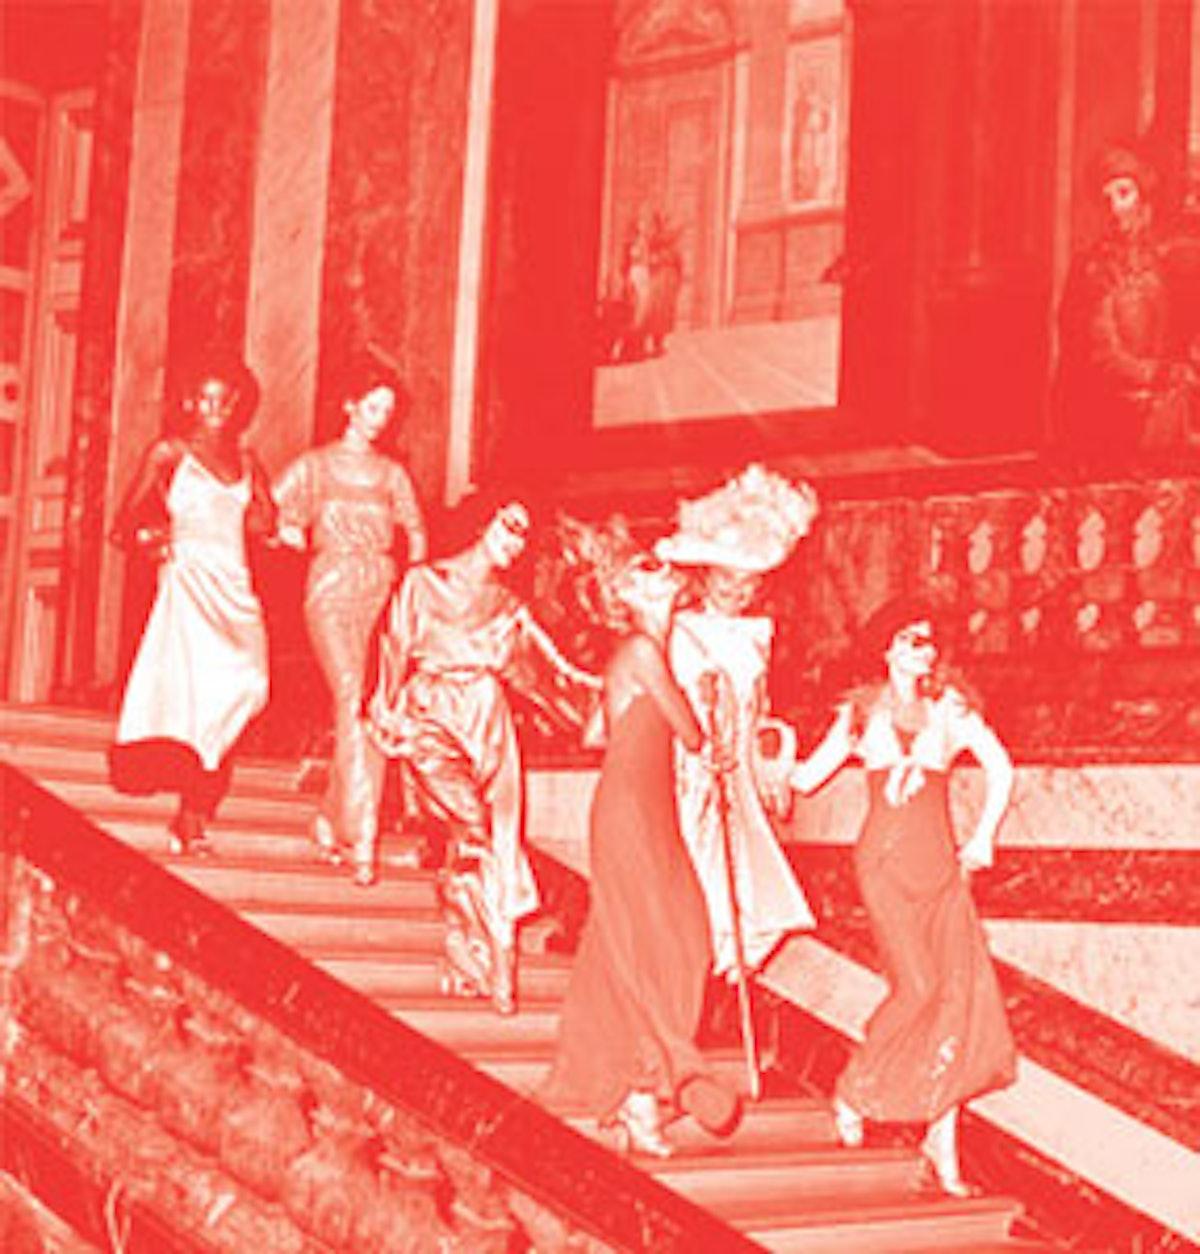 faar-fashion-scandals-40-years-02.jpg